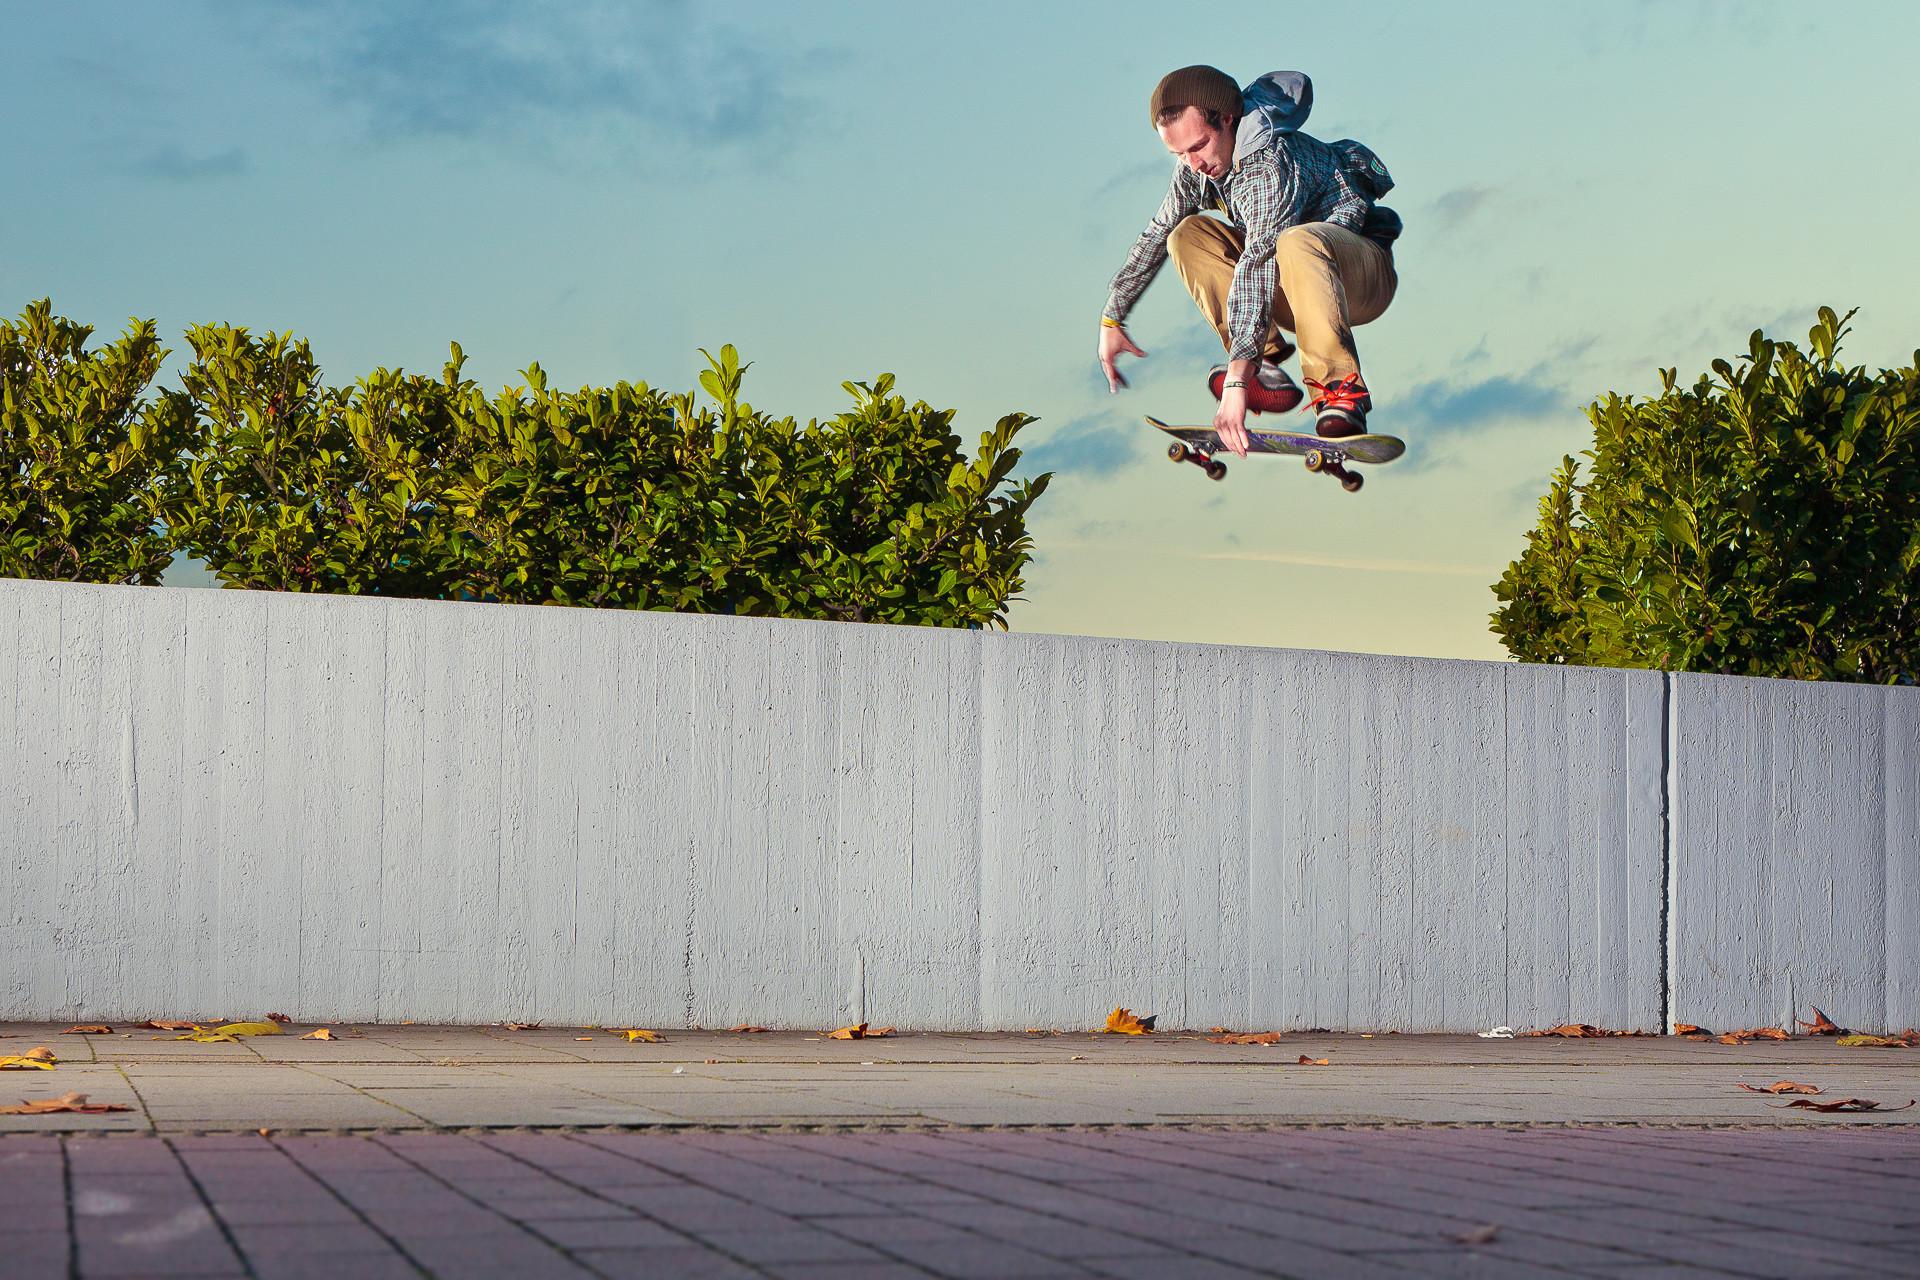 Action_Sport_Skateboard_Grap